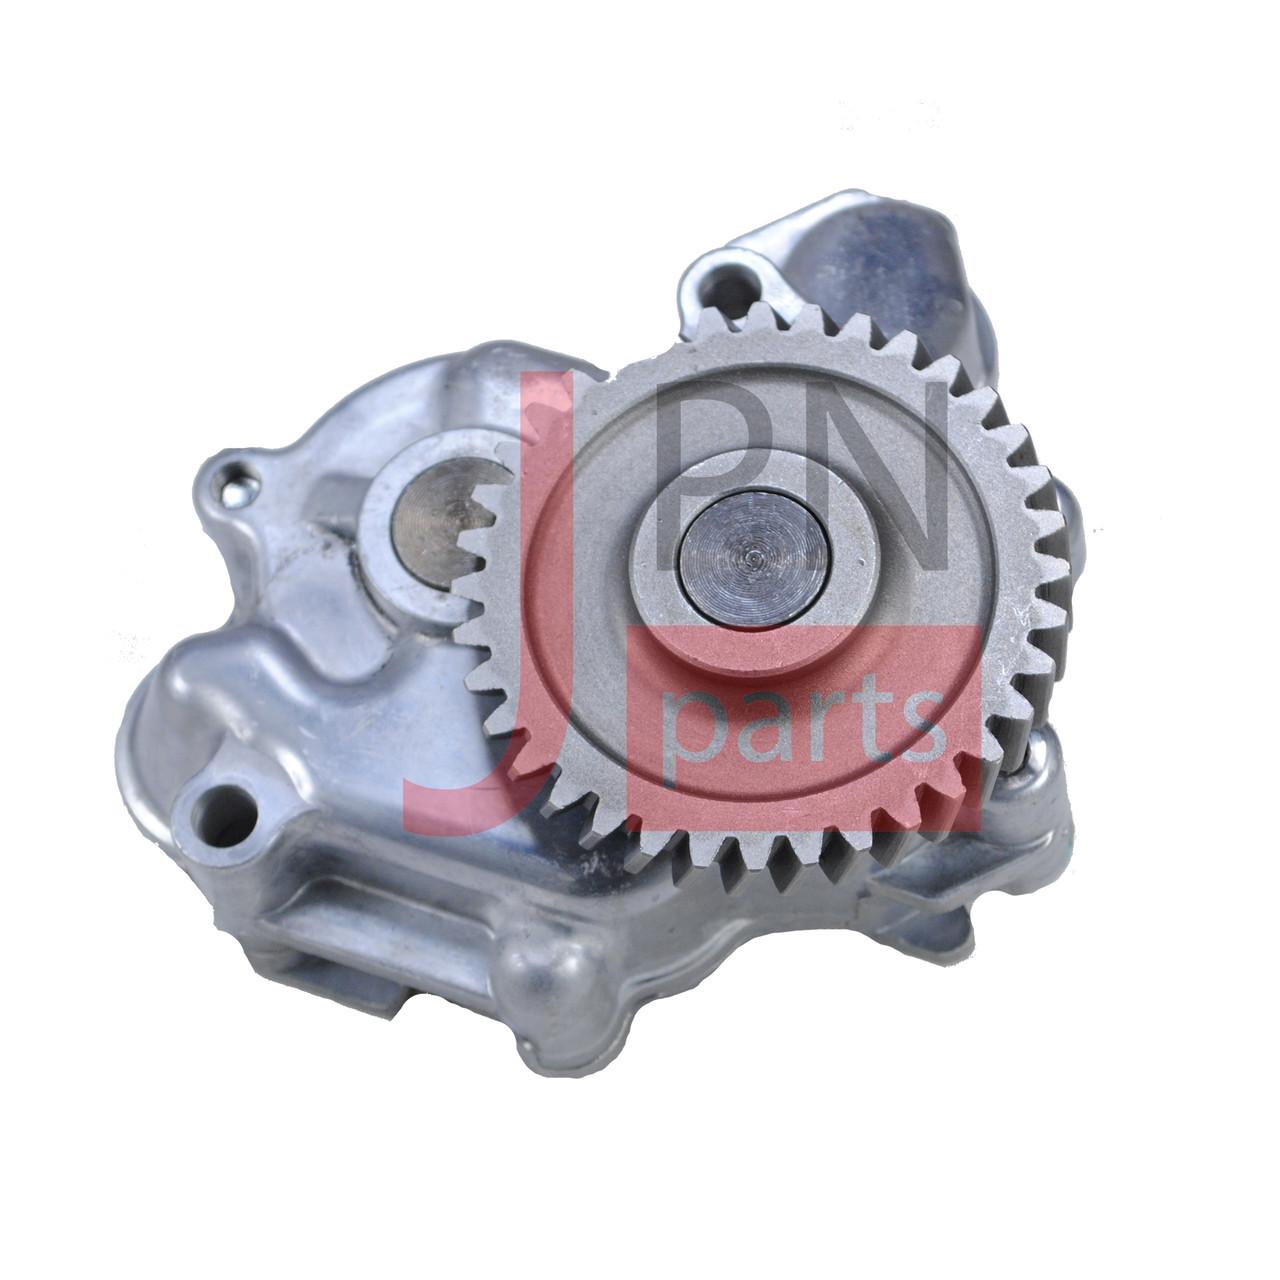 Насос масляний двигуна MITSUBISHI FUSO CANTER 515/635/659/859 (4D34T) (ME017484) JAPACO